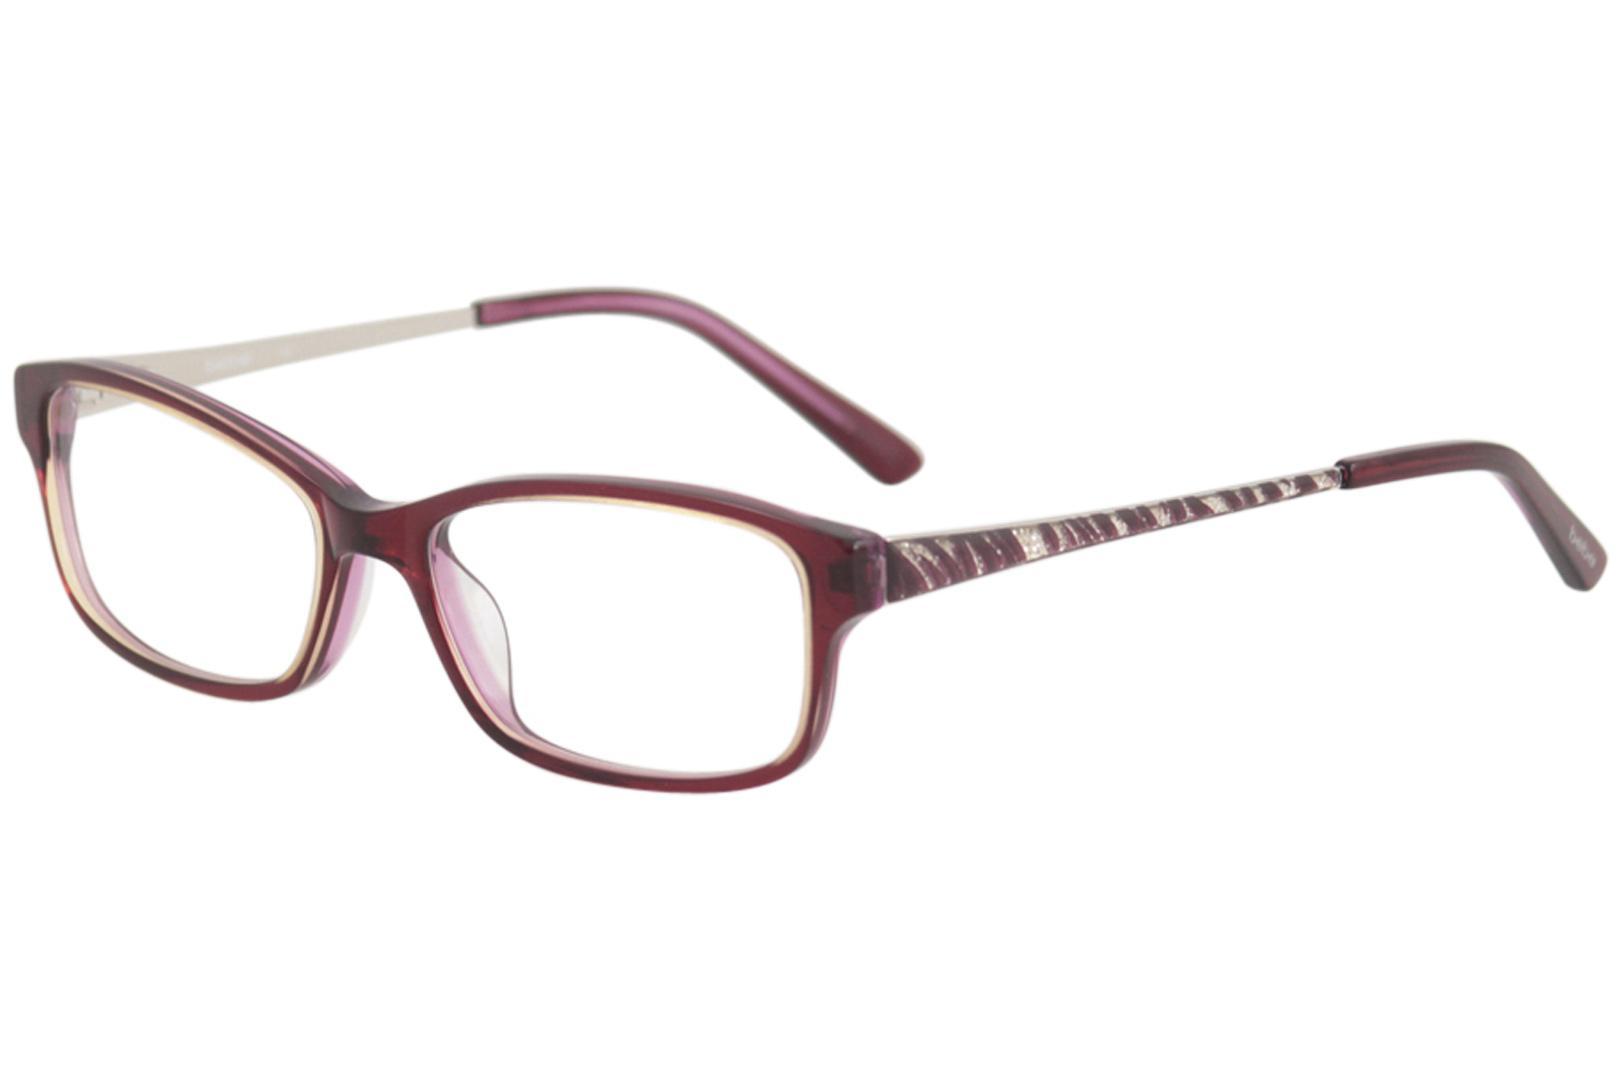 280c841d6aa Bebe Women s Shine Eyeglasses BB5122 BB 5122 Full Rim Optical Frame by Bebe.  Touch to zoom